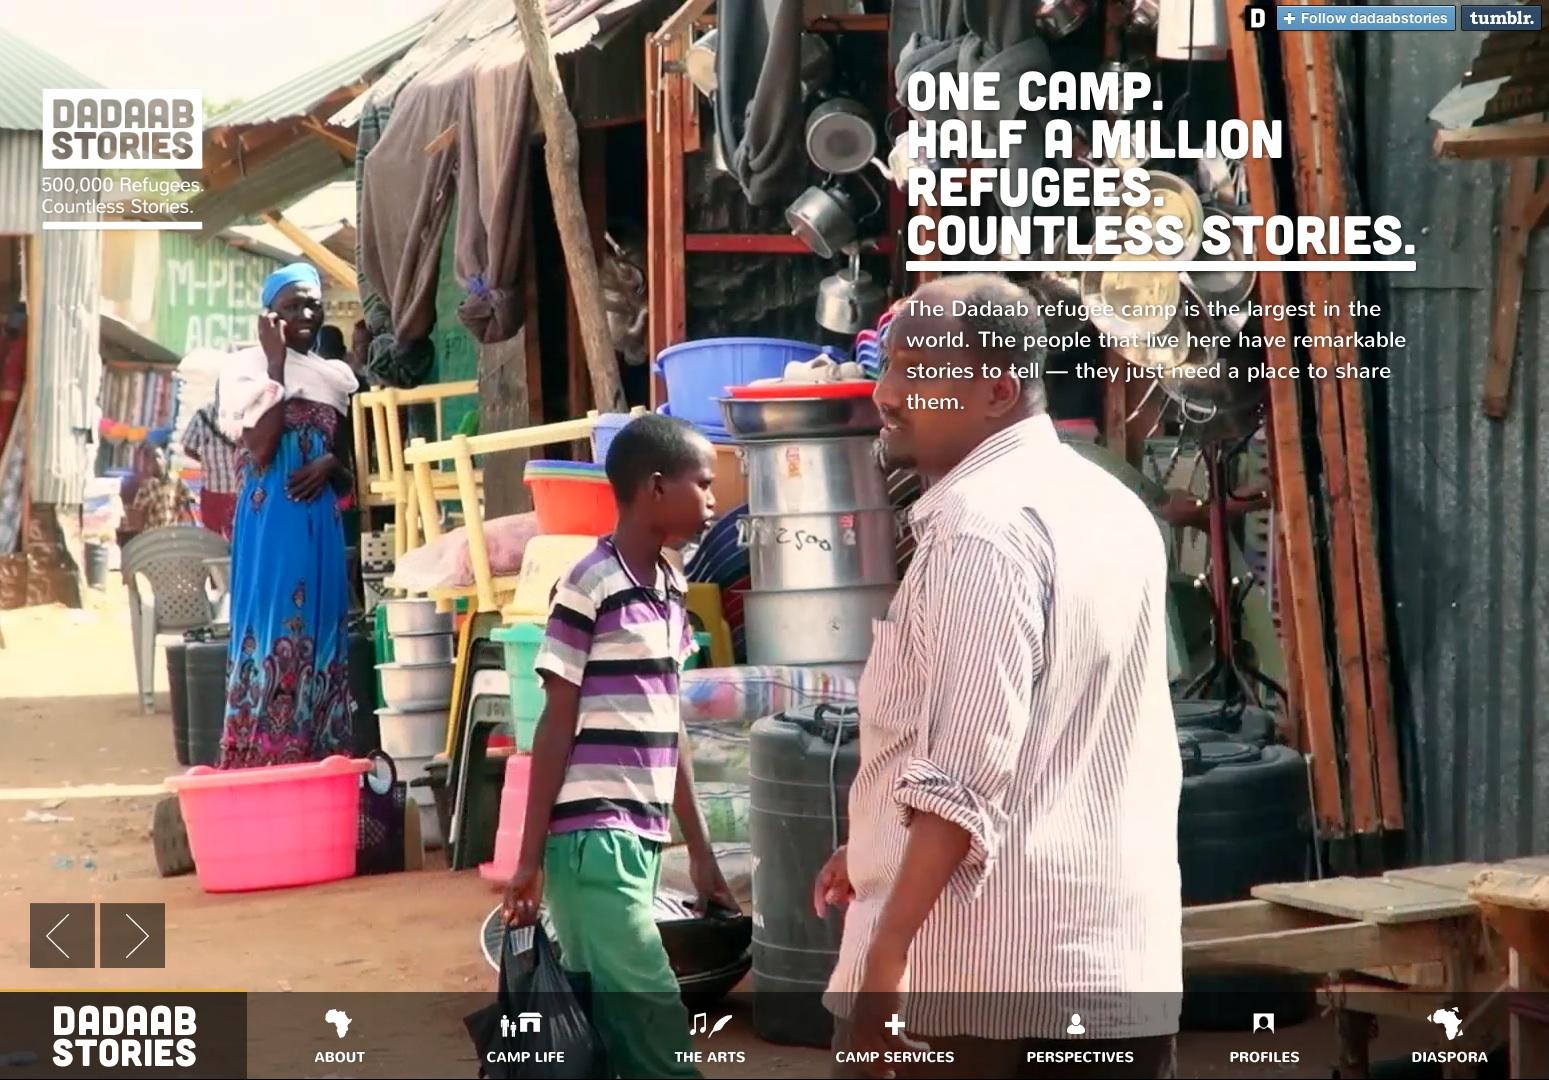 Dadaab Stories